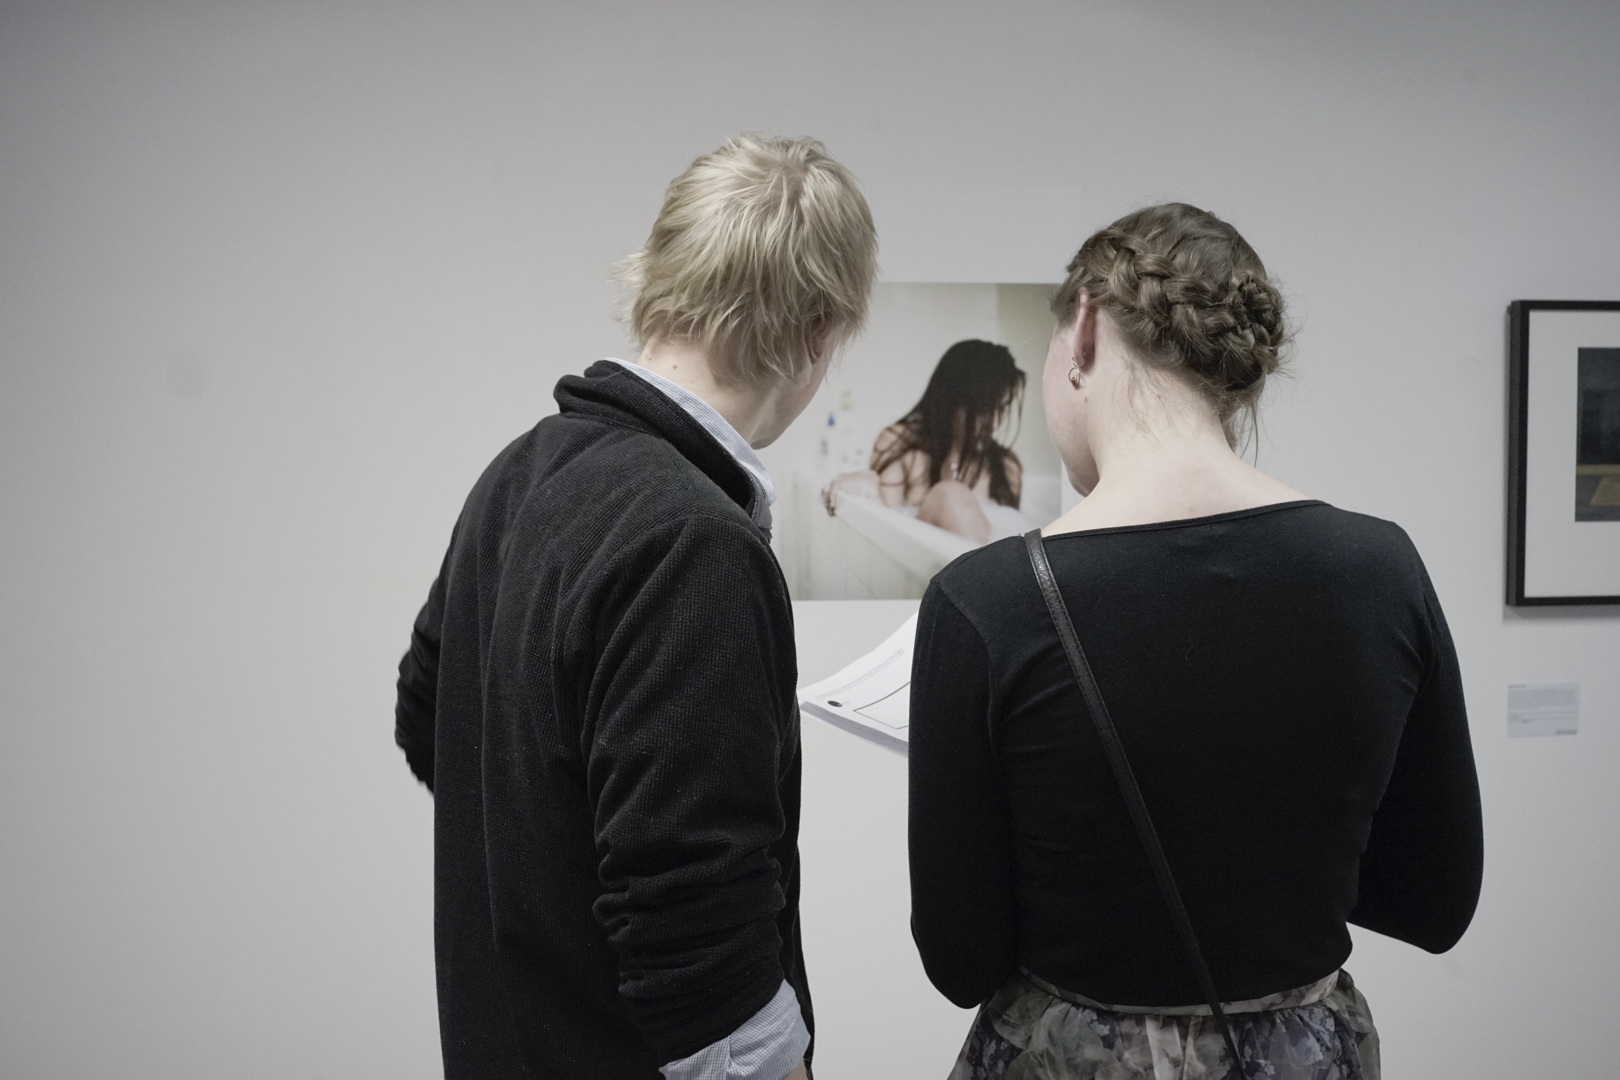 transition-exhibition-contactsheet-photo-13.JPG